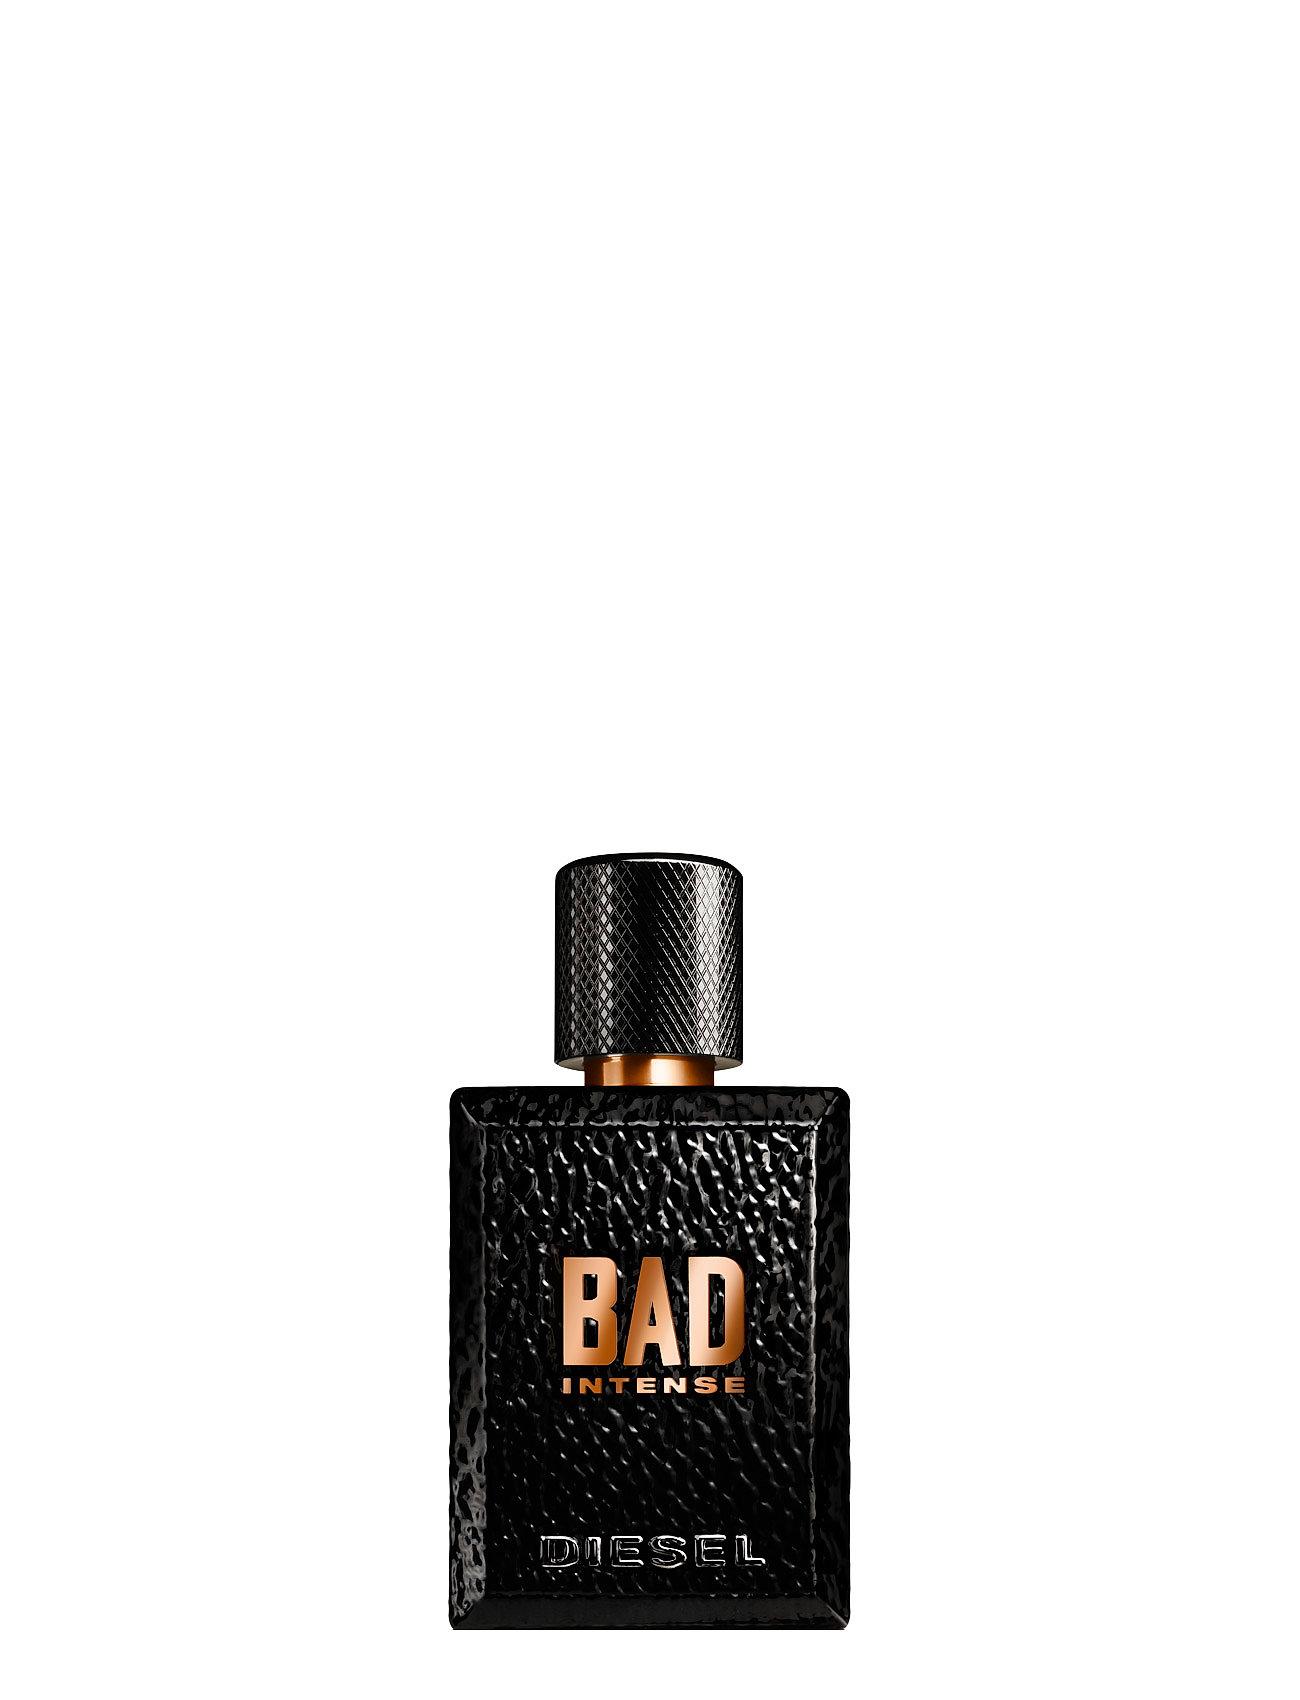 diesel - fragrance Diesel bad intense eau de parfum 50 ml fra boozt.com dk